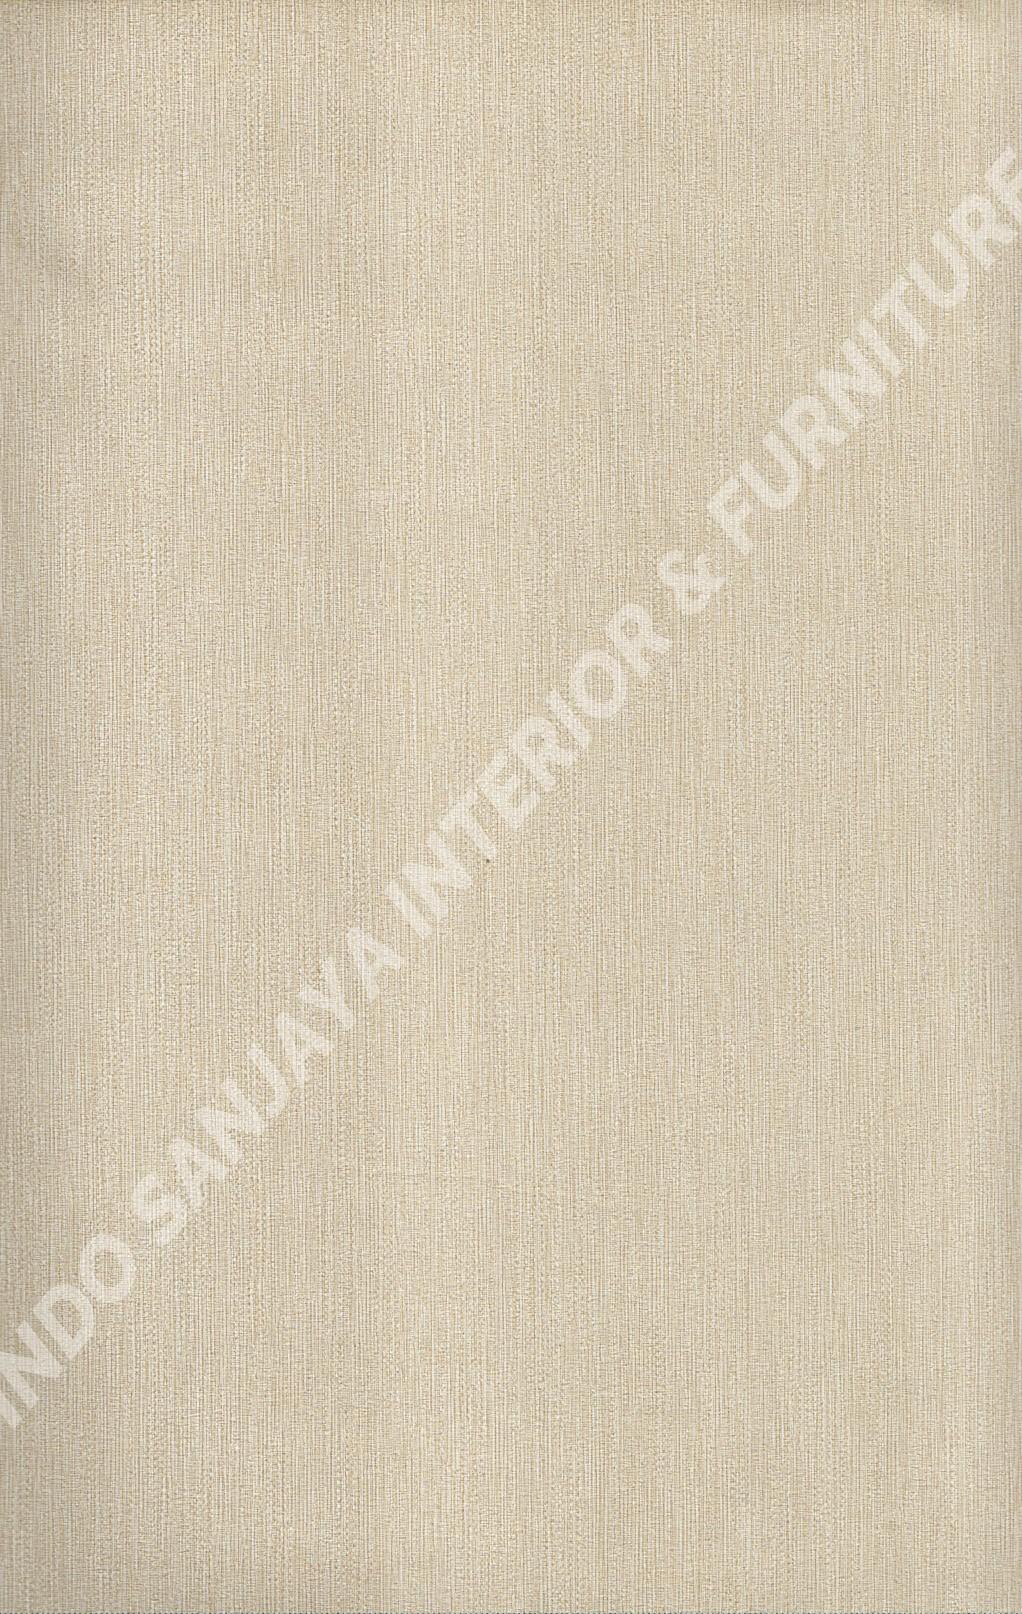 wallpaper   Wallpaper Minimalis Polos 81084-3:81084-3 corak  warna